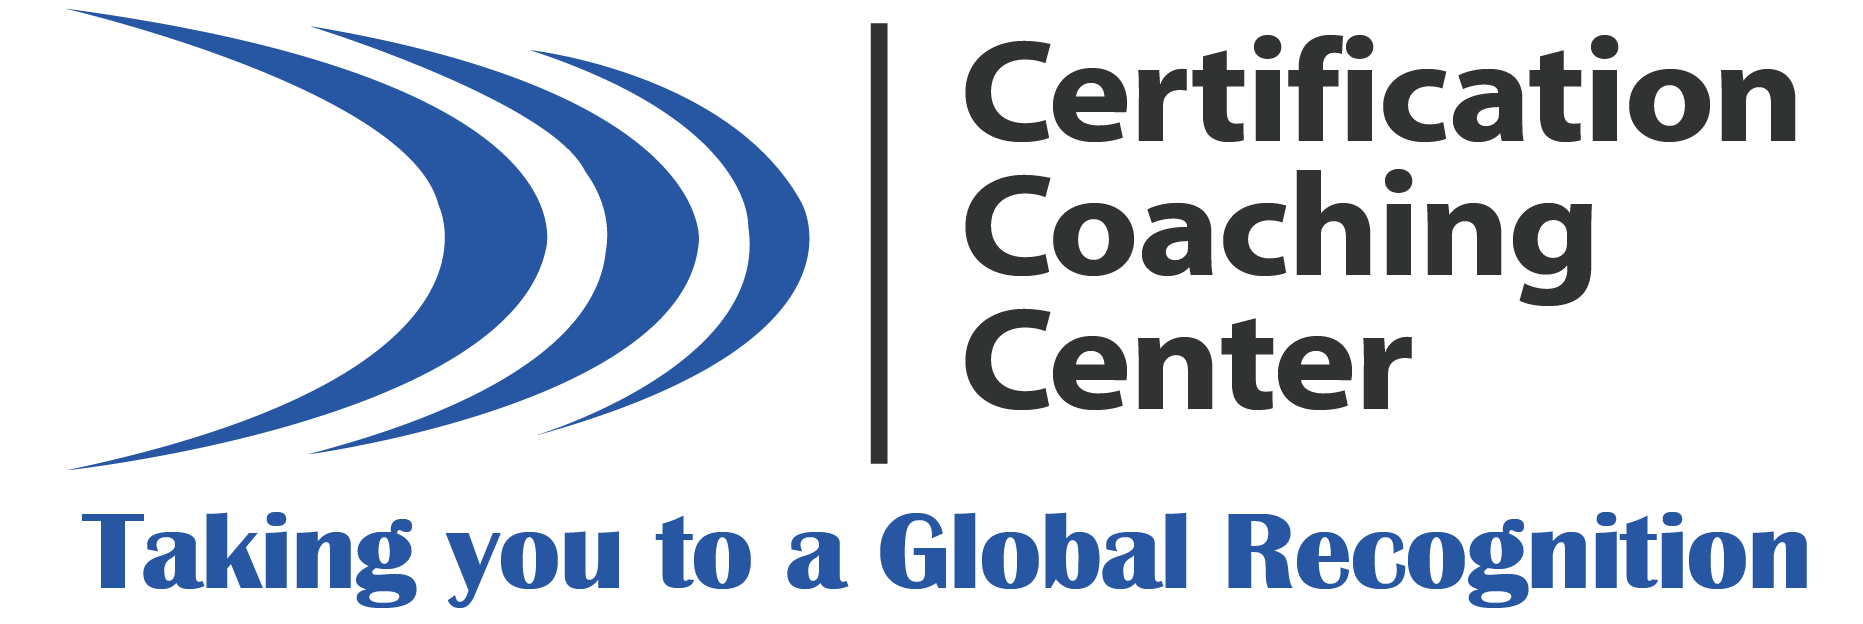 Certification Coaching Center